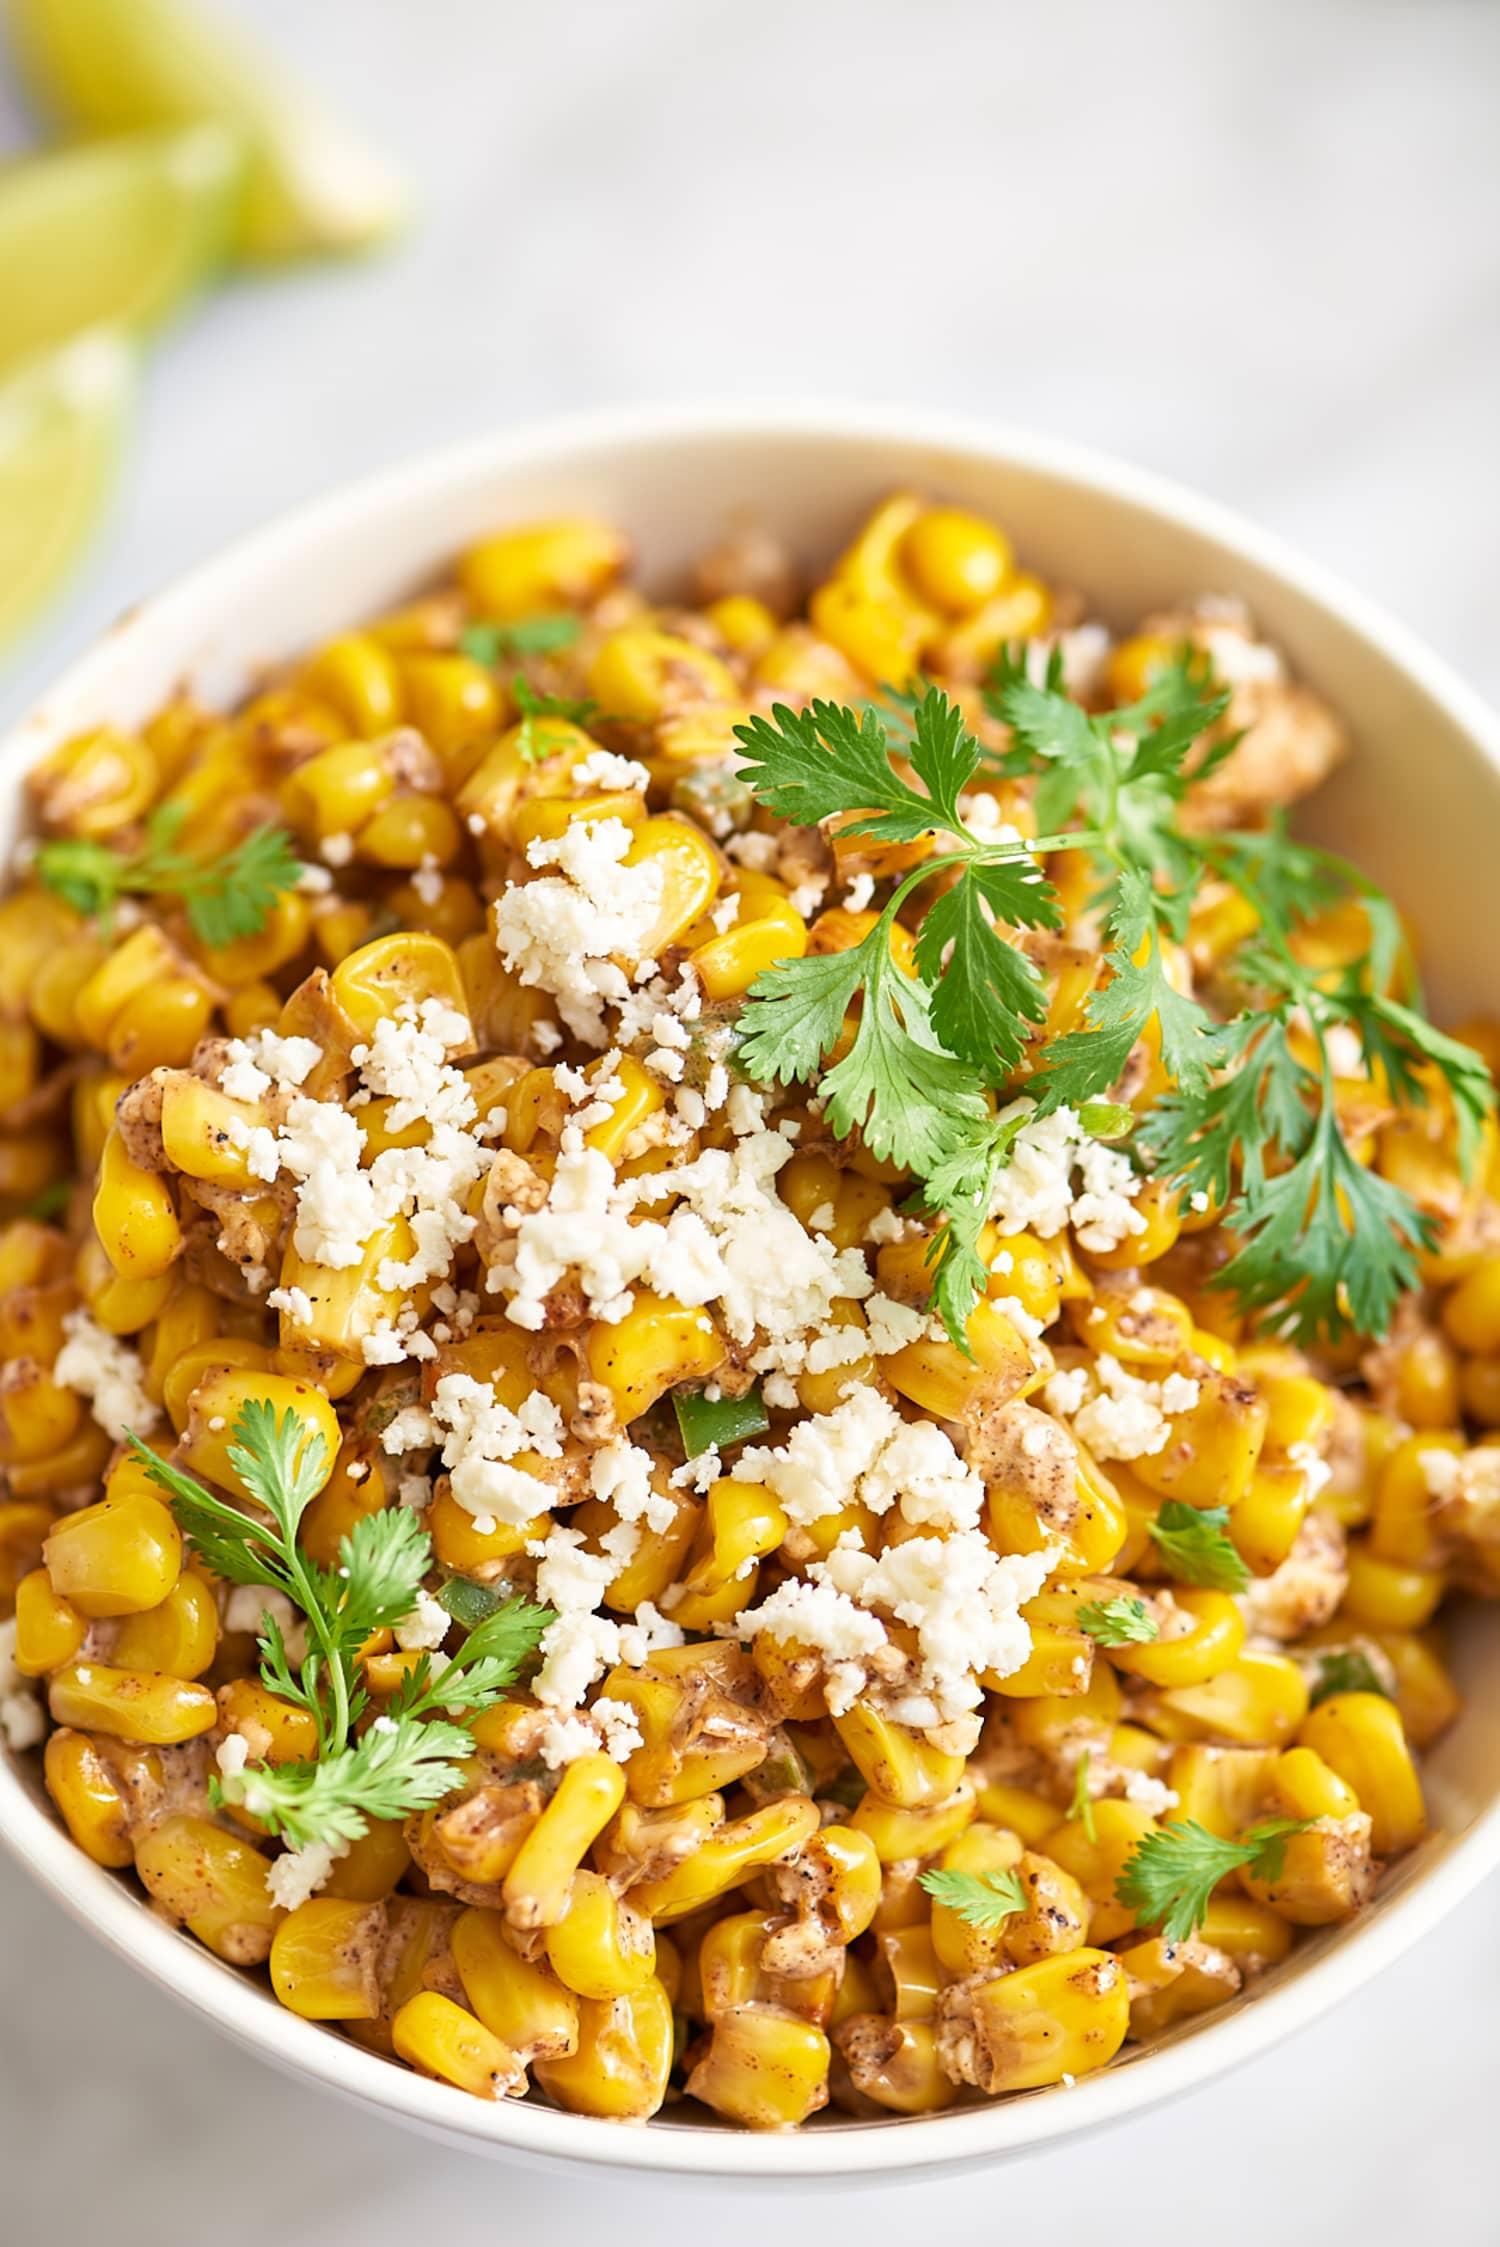 Recipe: Esquites (Mexican Corn Salad)